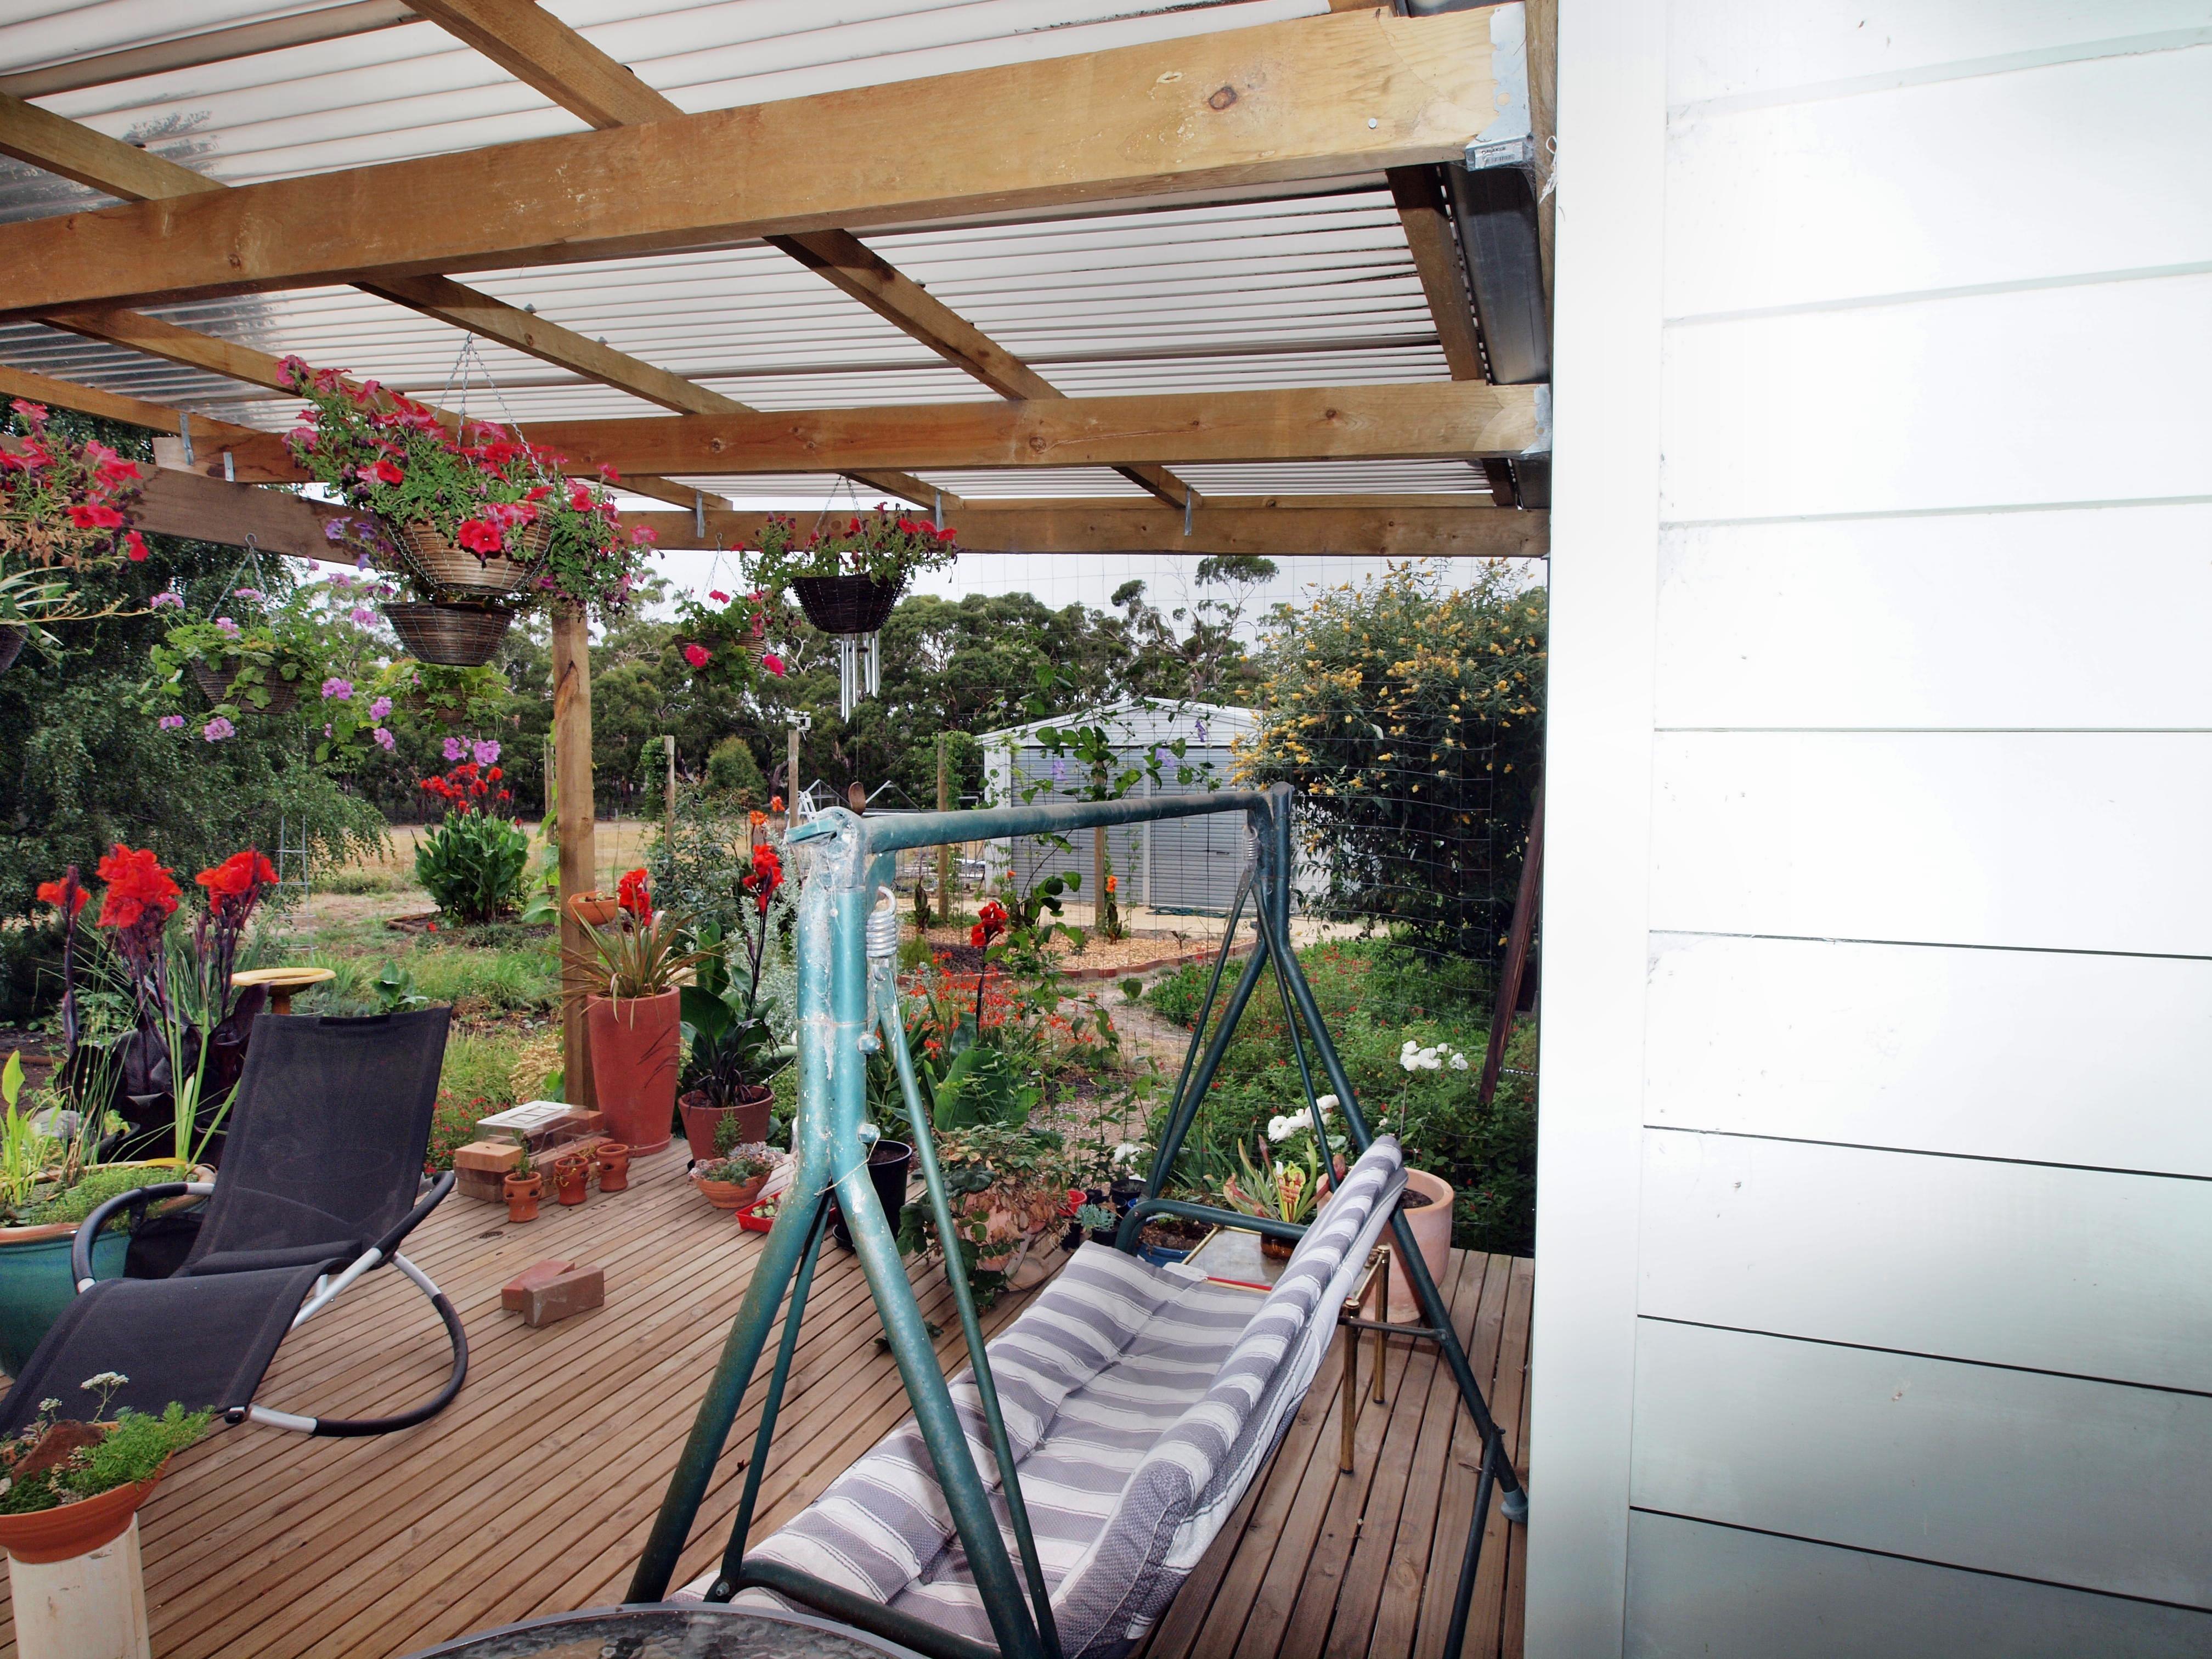 verandah-6-10mm.jpeg